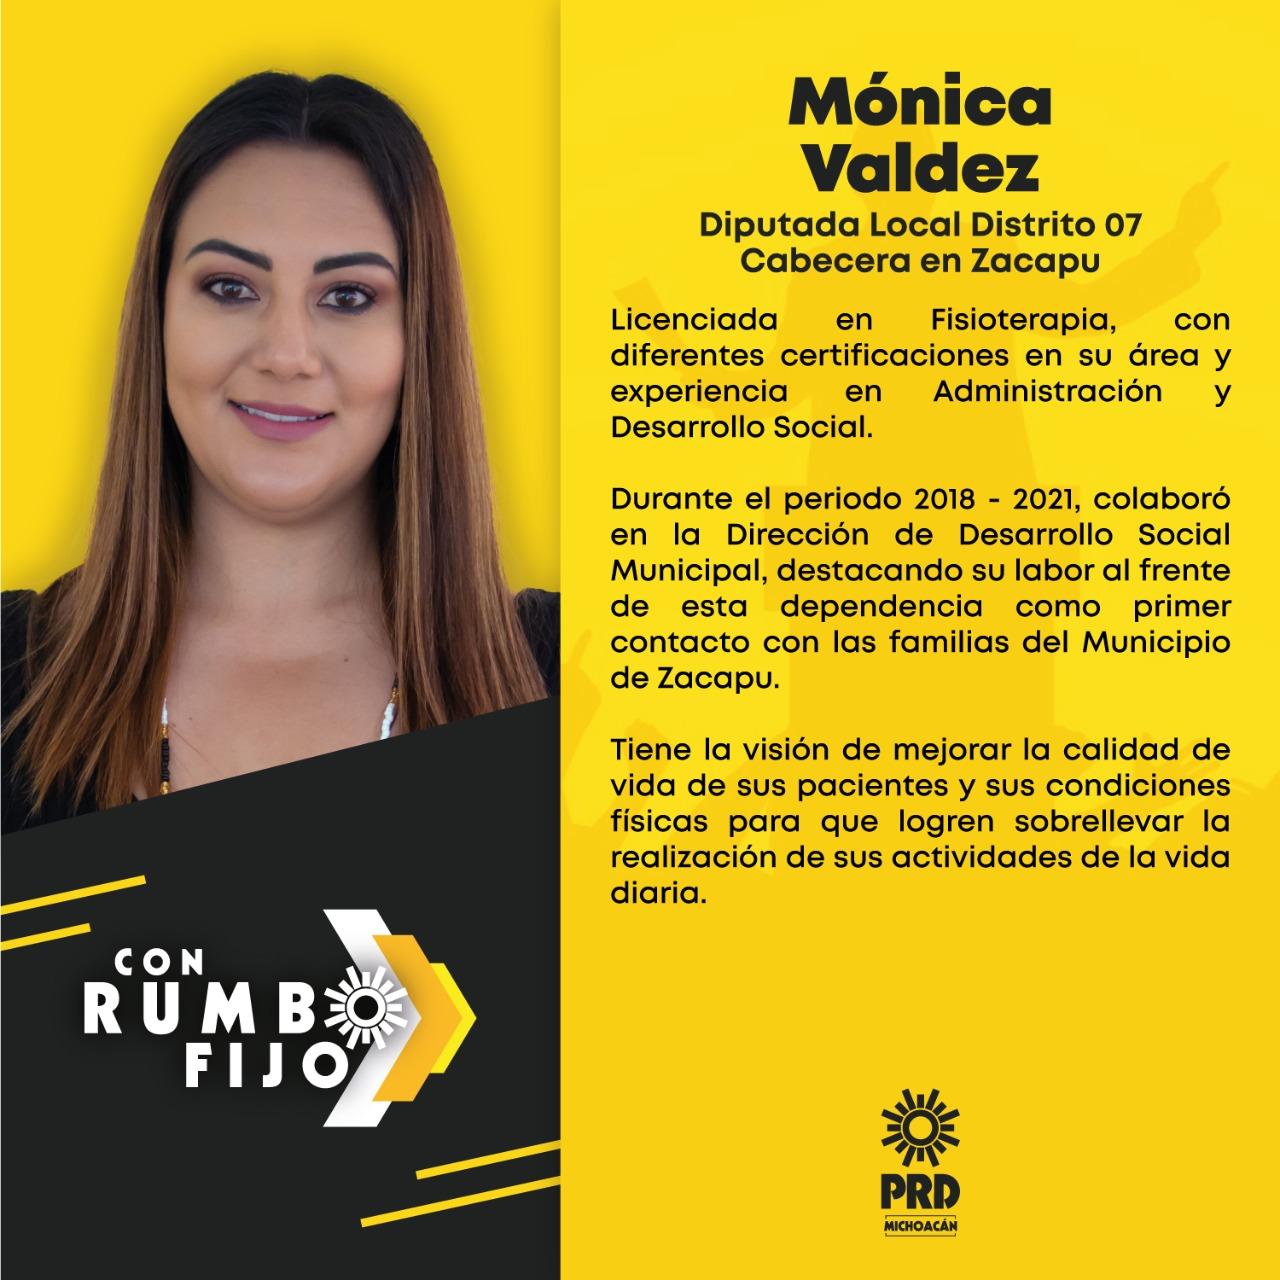 FMónica Valdez, Diputada local Distrito 07 Cabecera en Zacapu